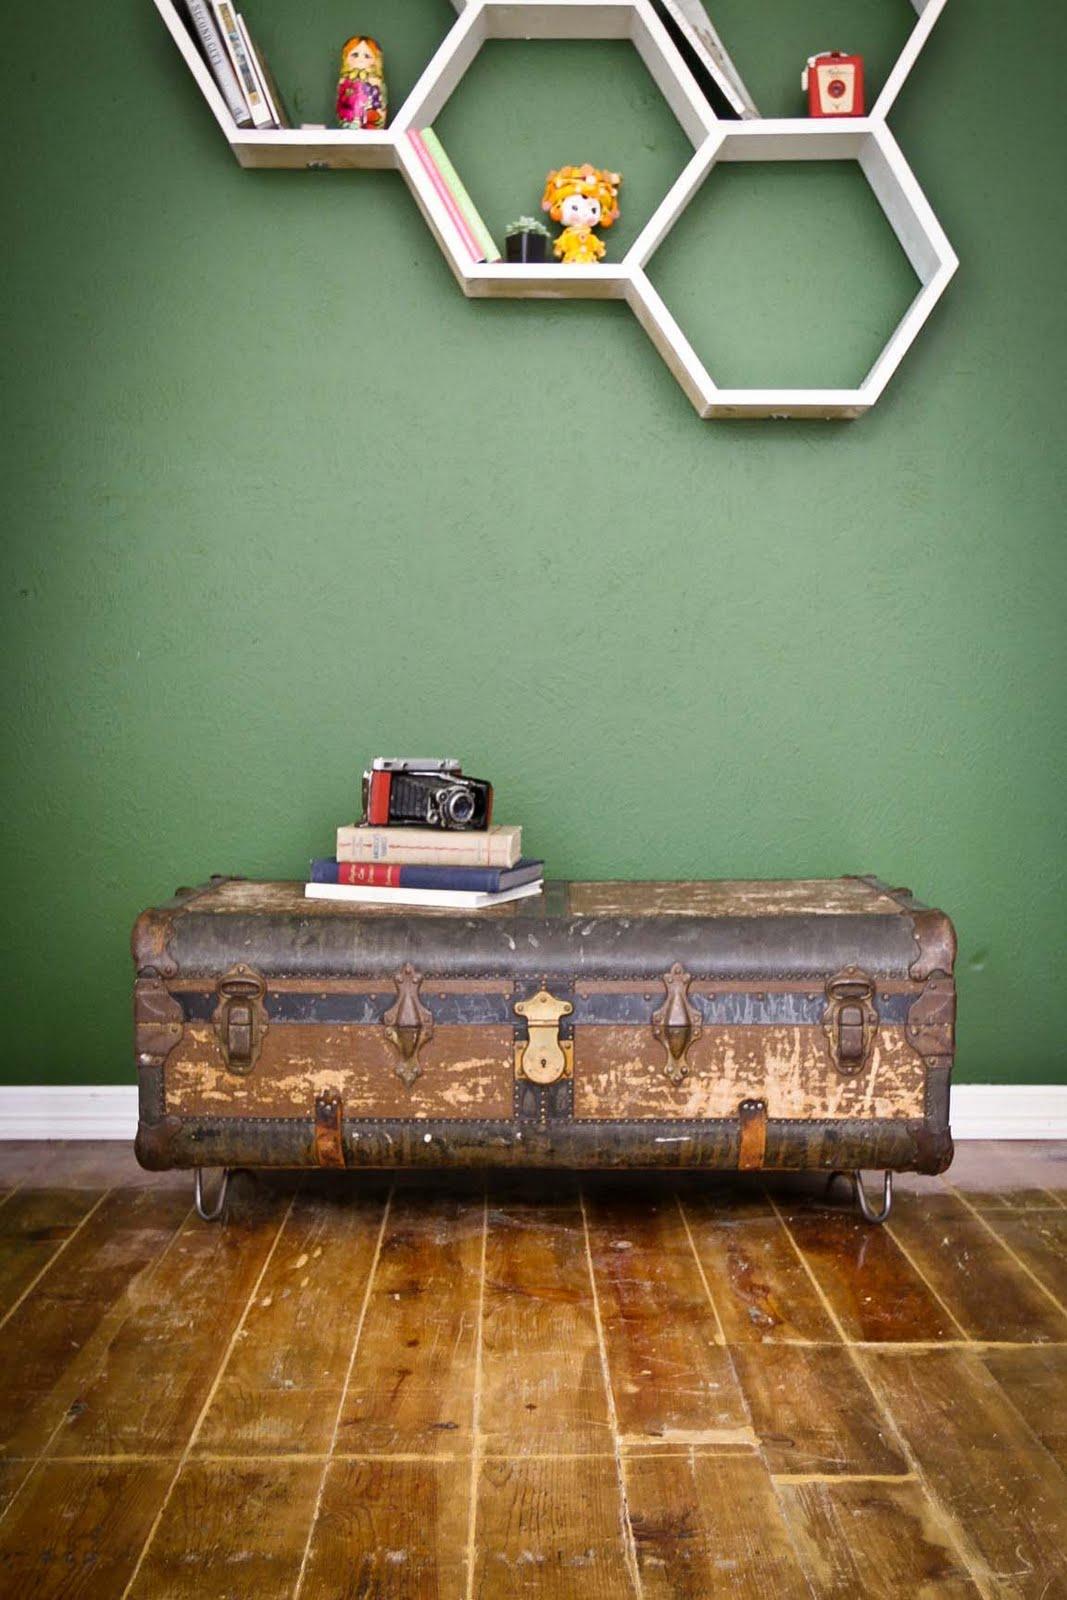 ... Dingaling Vintage----->: Vintage Suitcase Coffee Table #7